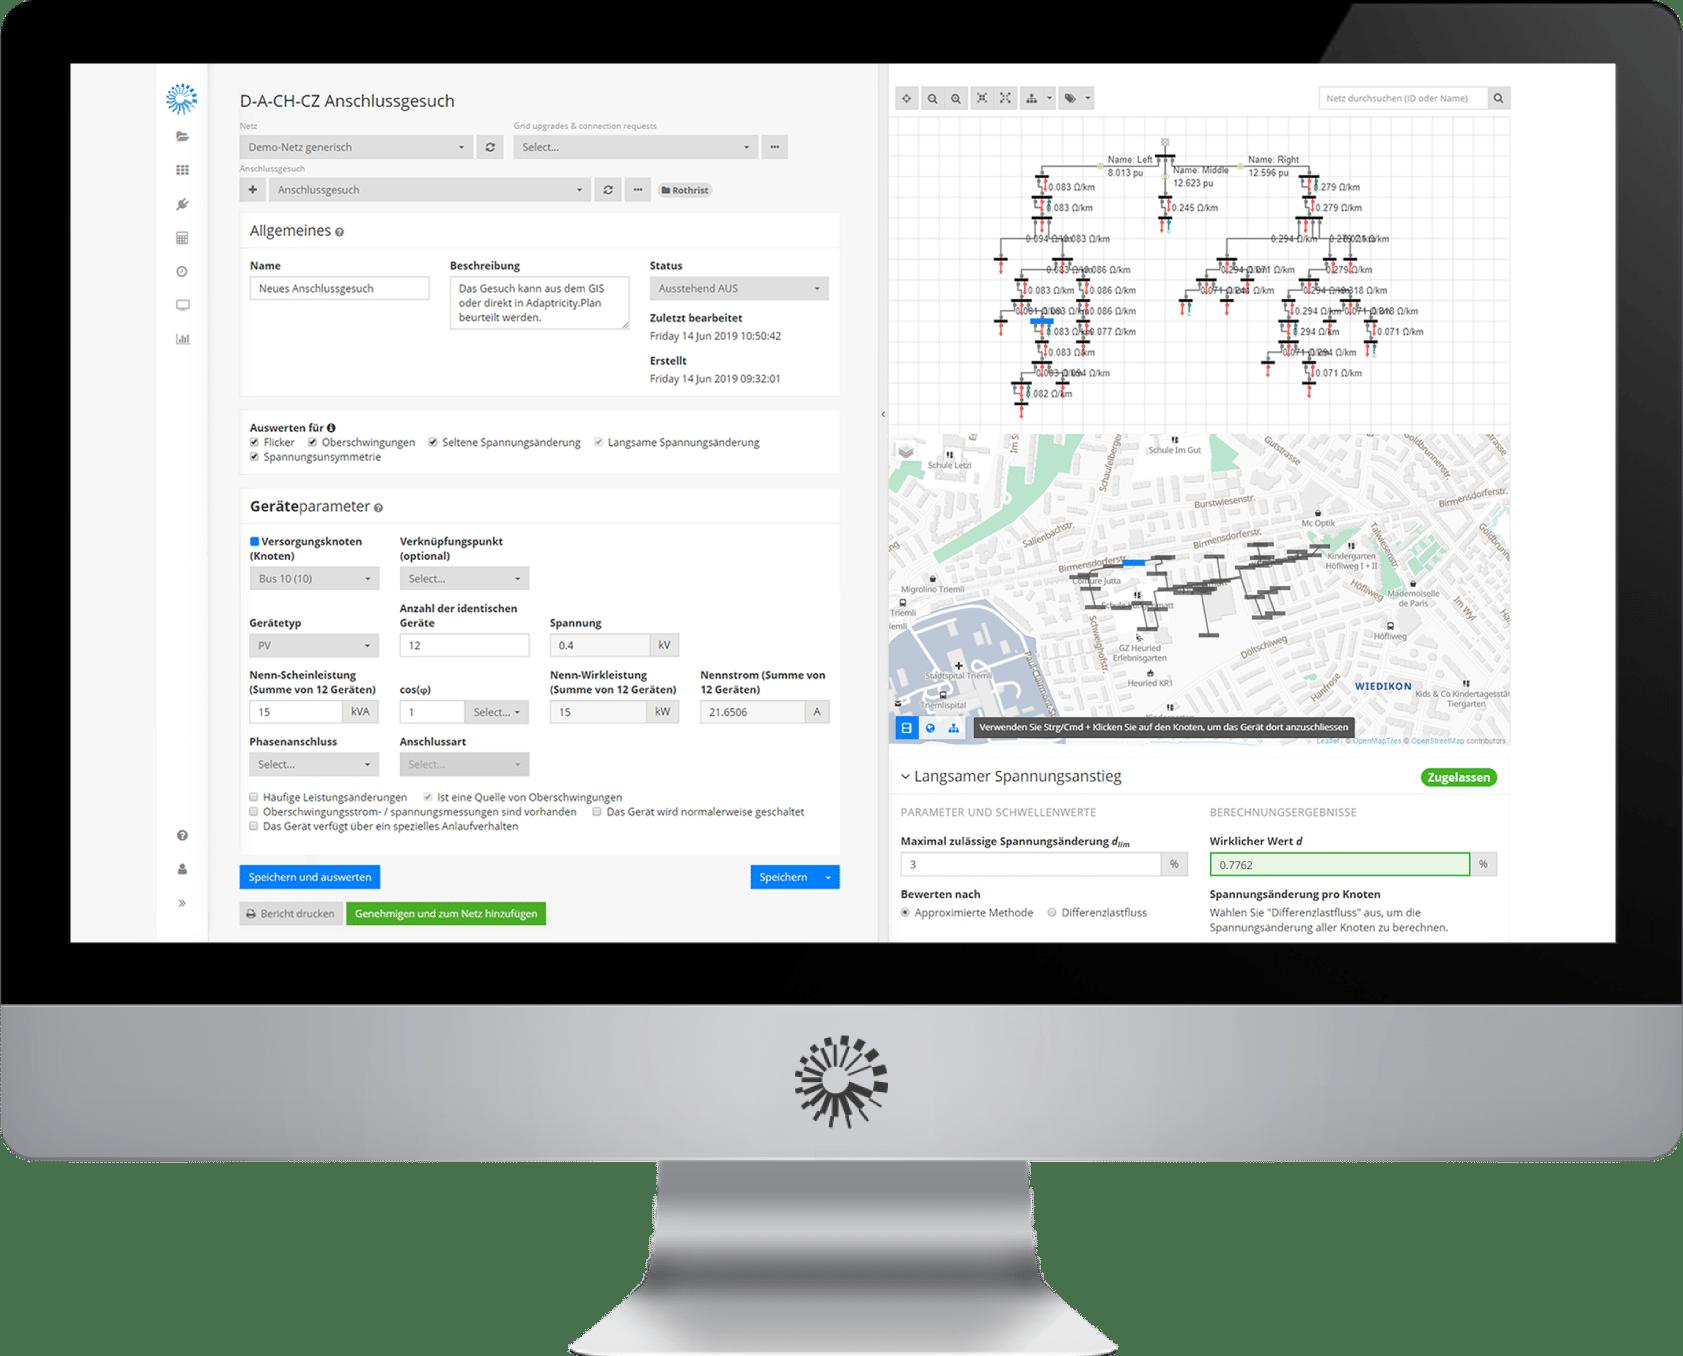 Adaptricity.Plan Interactive Screen